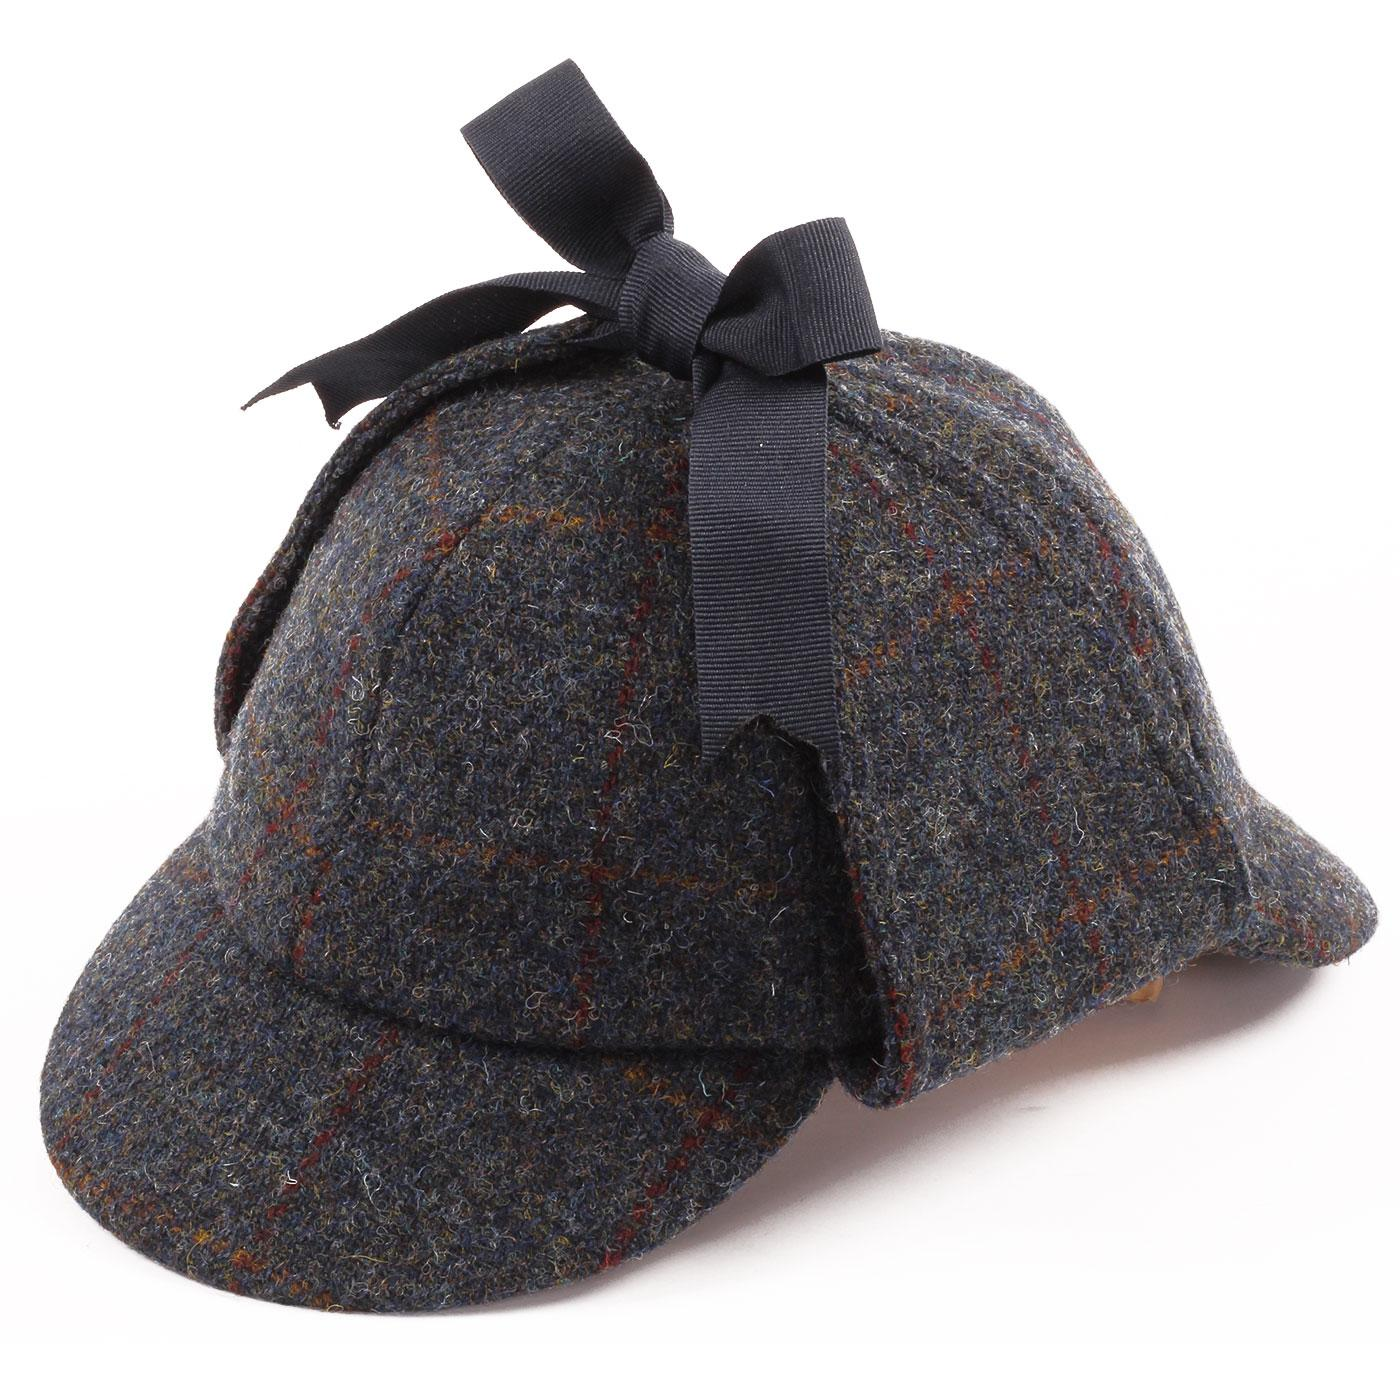 Sherlock FAILSWORTH Harris Tweed Deerstalker Hat B